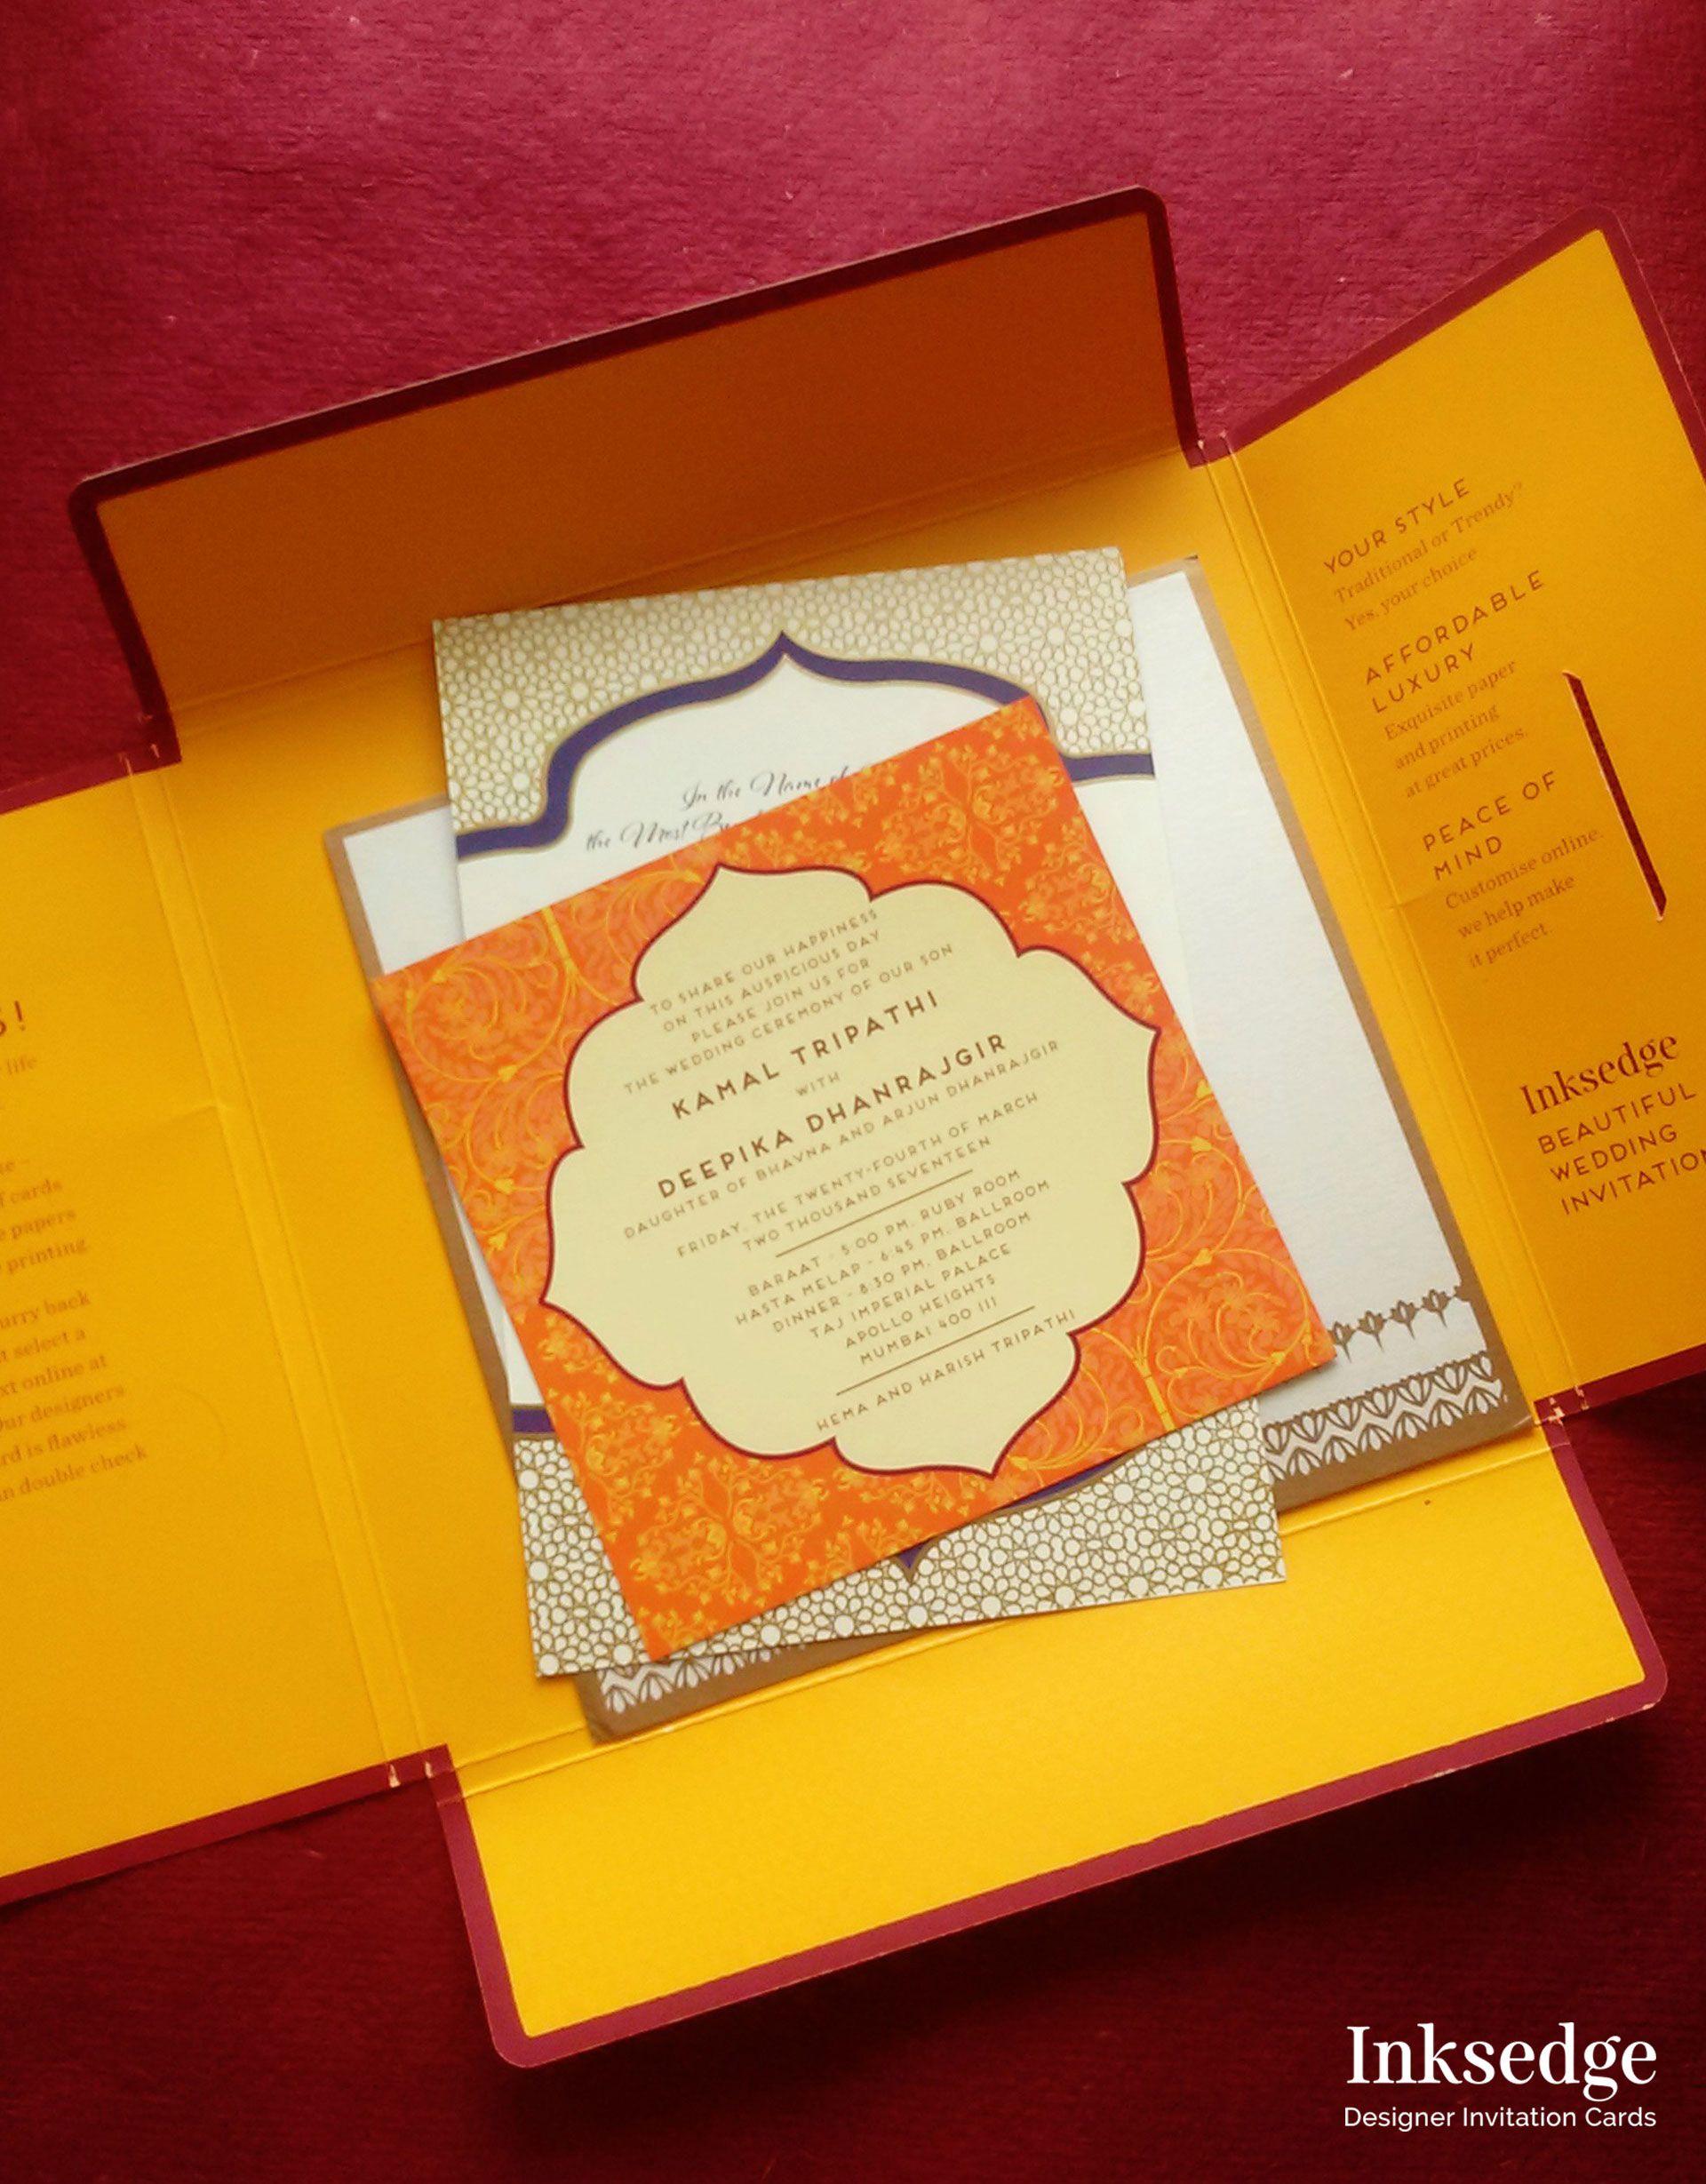 Nikah Mubarak Islamic Wedding Card Samples Now Available Http Www Inksedge Com Shop Islamic Wedding Cards Wedding Card Sample Islamic Wedding Wedding Cards